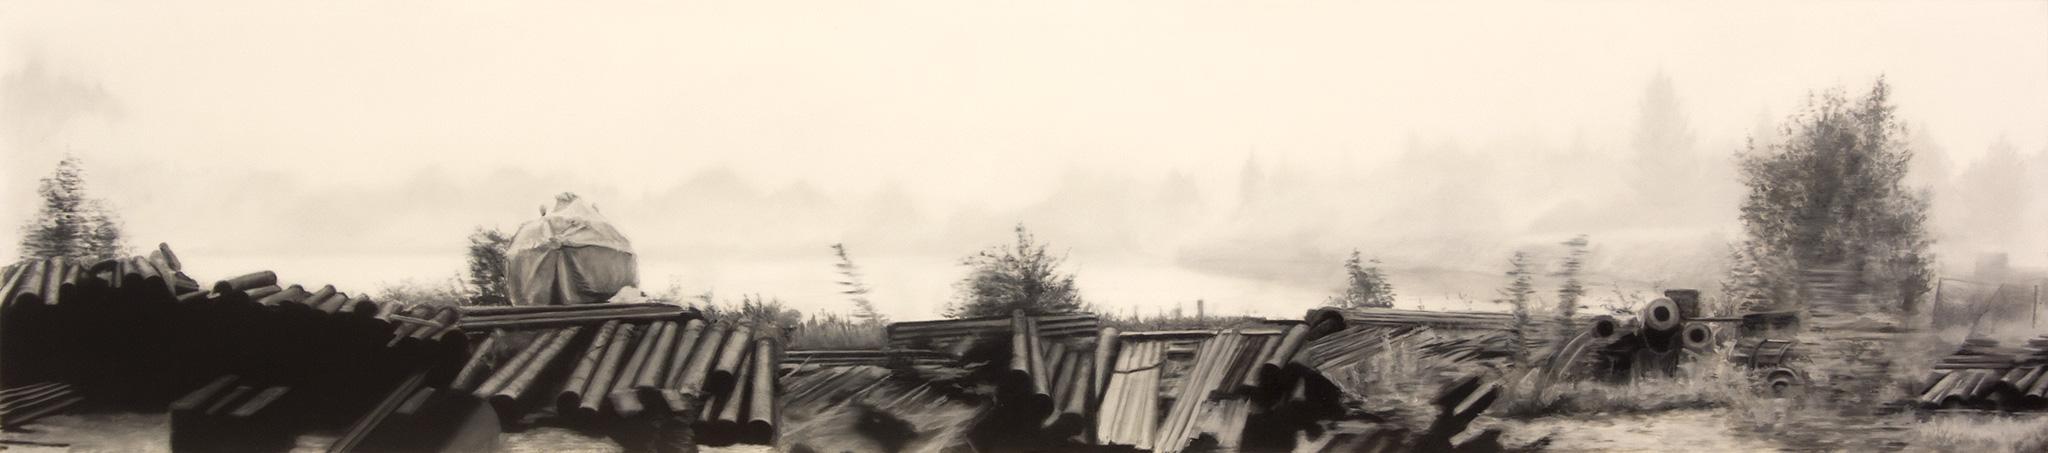 Railroad II Óleo sobre poliéster 40 x 180 cm 2019